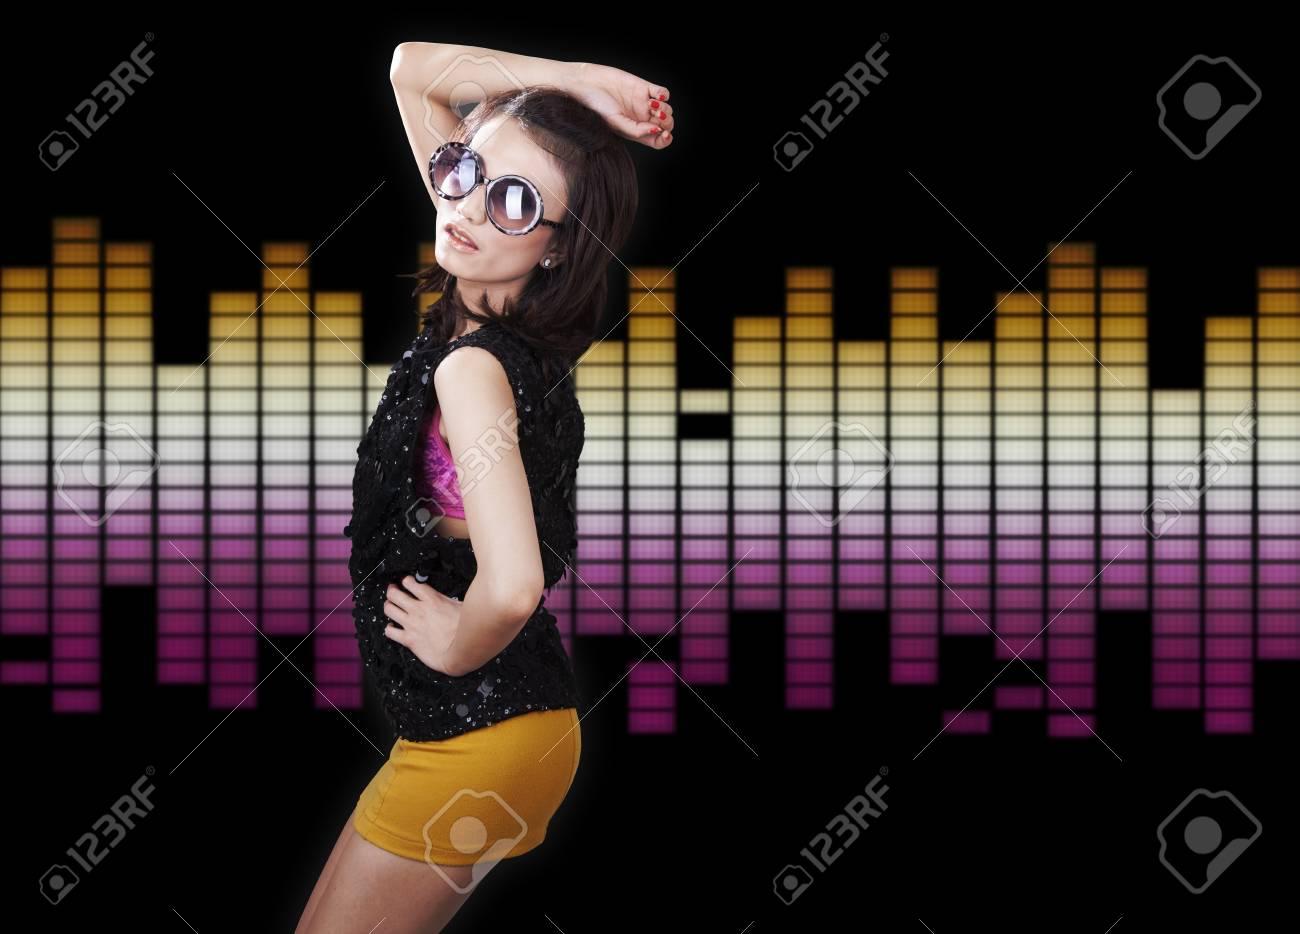 Pretty Mixed caucasian-asian woman dancing with sunglasses Stock Photo - 11252385